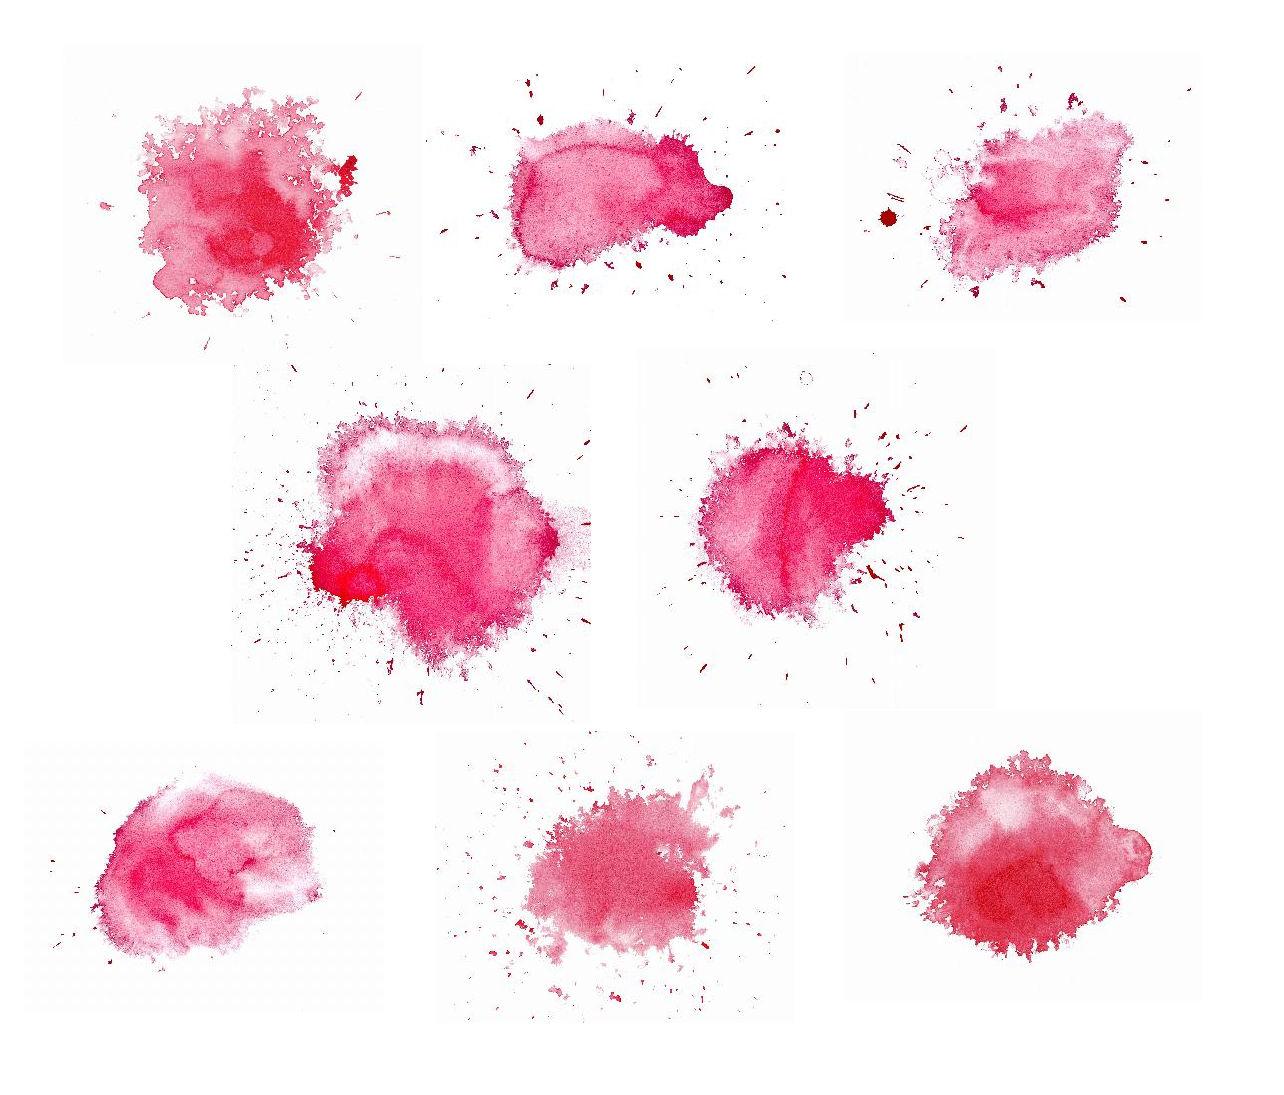 8-red-watercolor-splash-cover.jpg